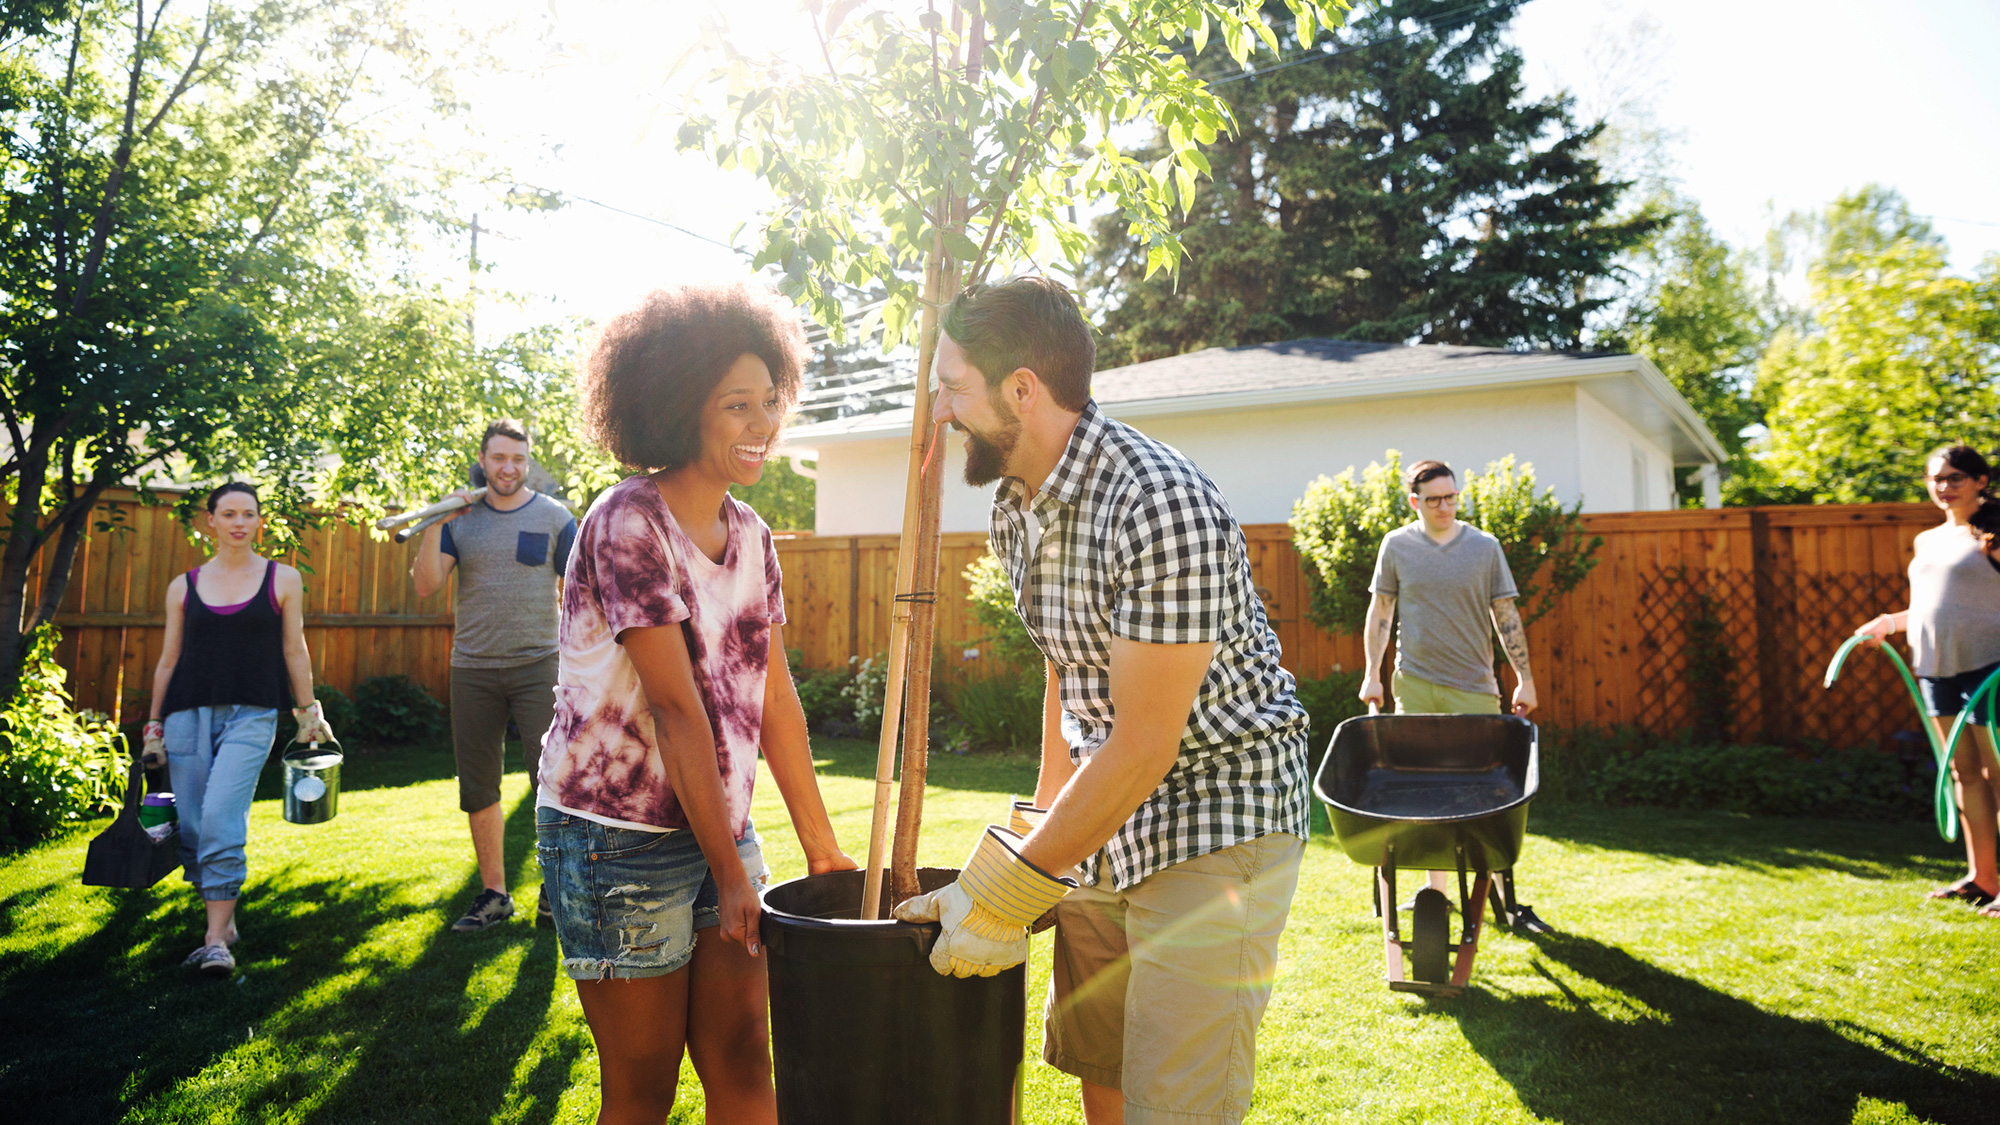 meeting-neighbors-ideas